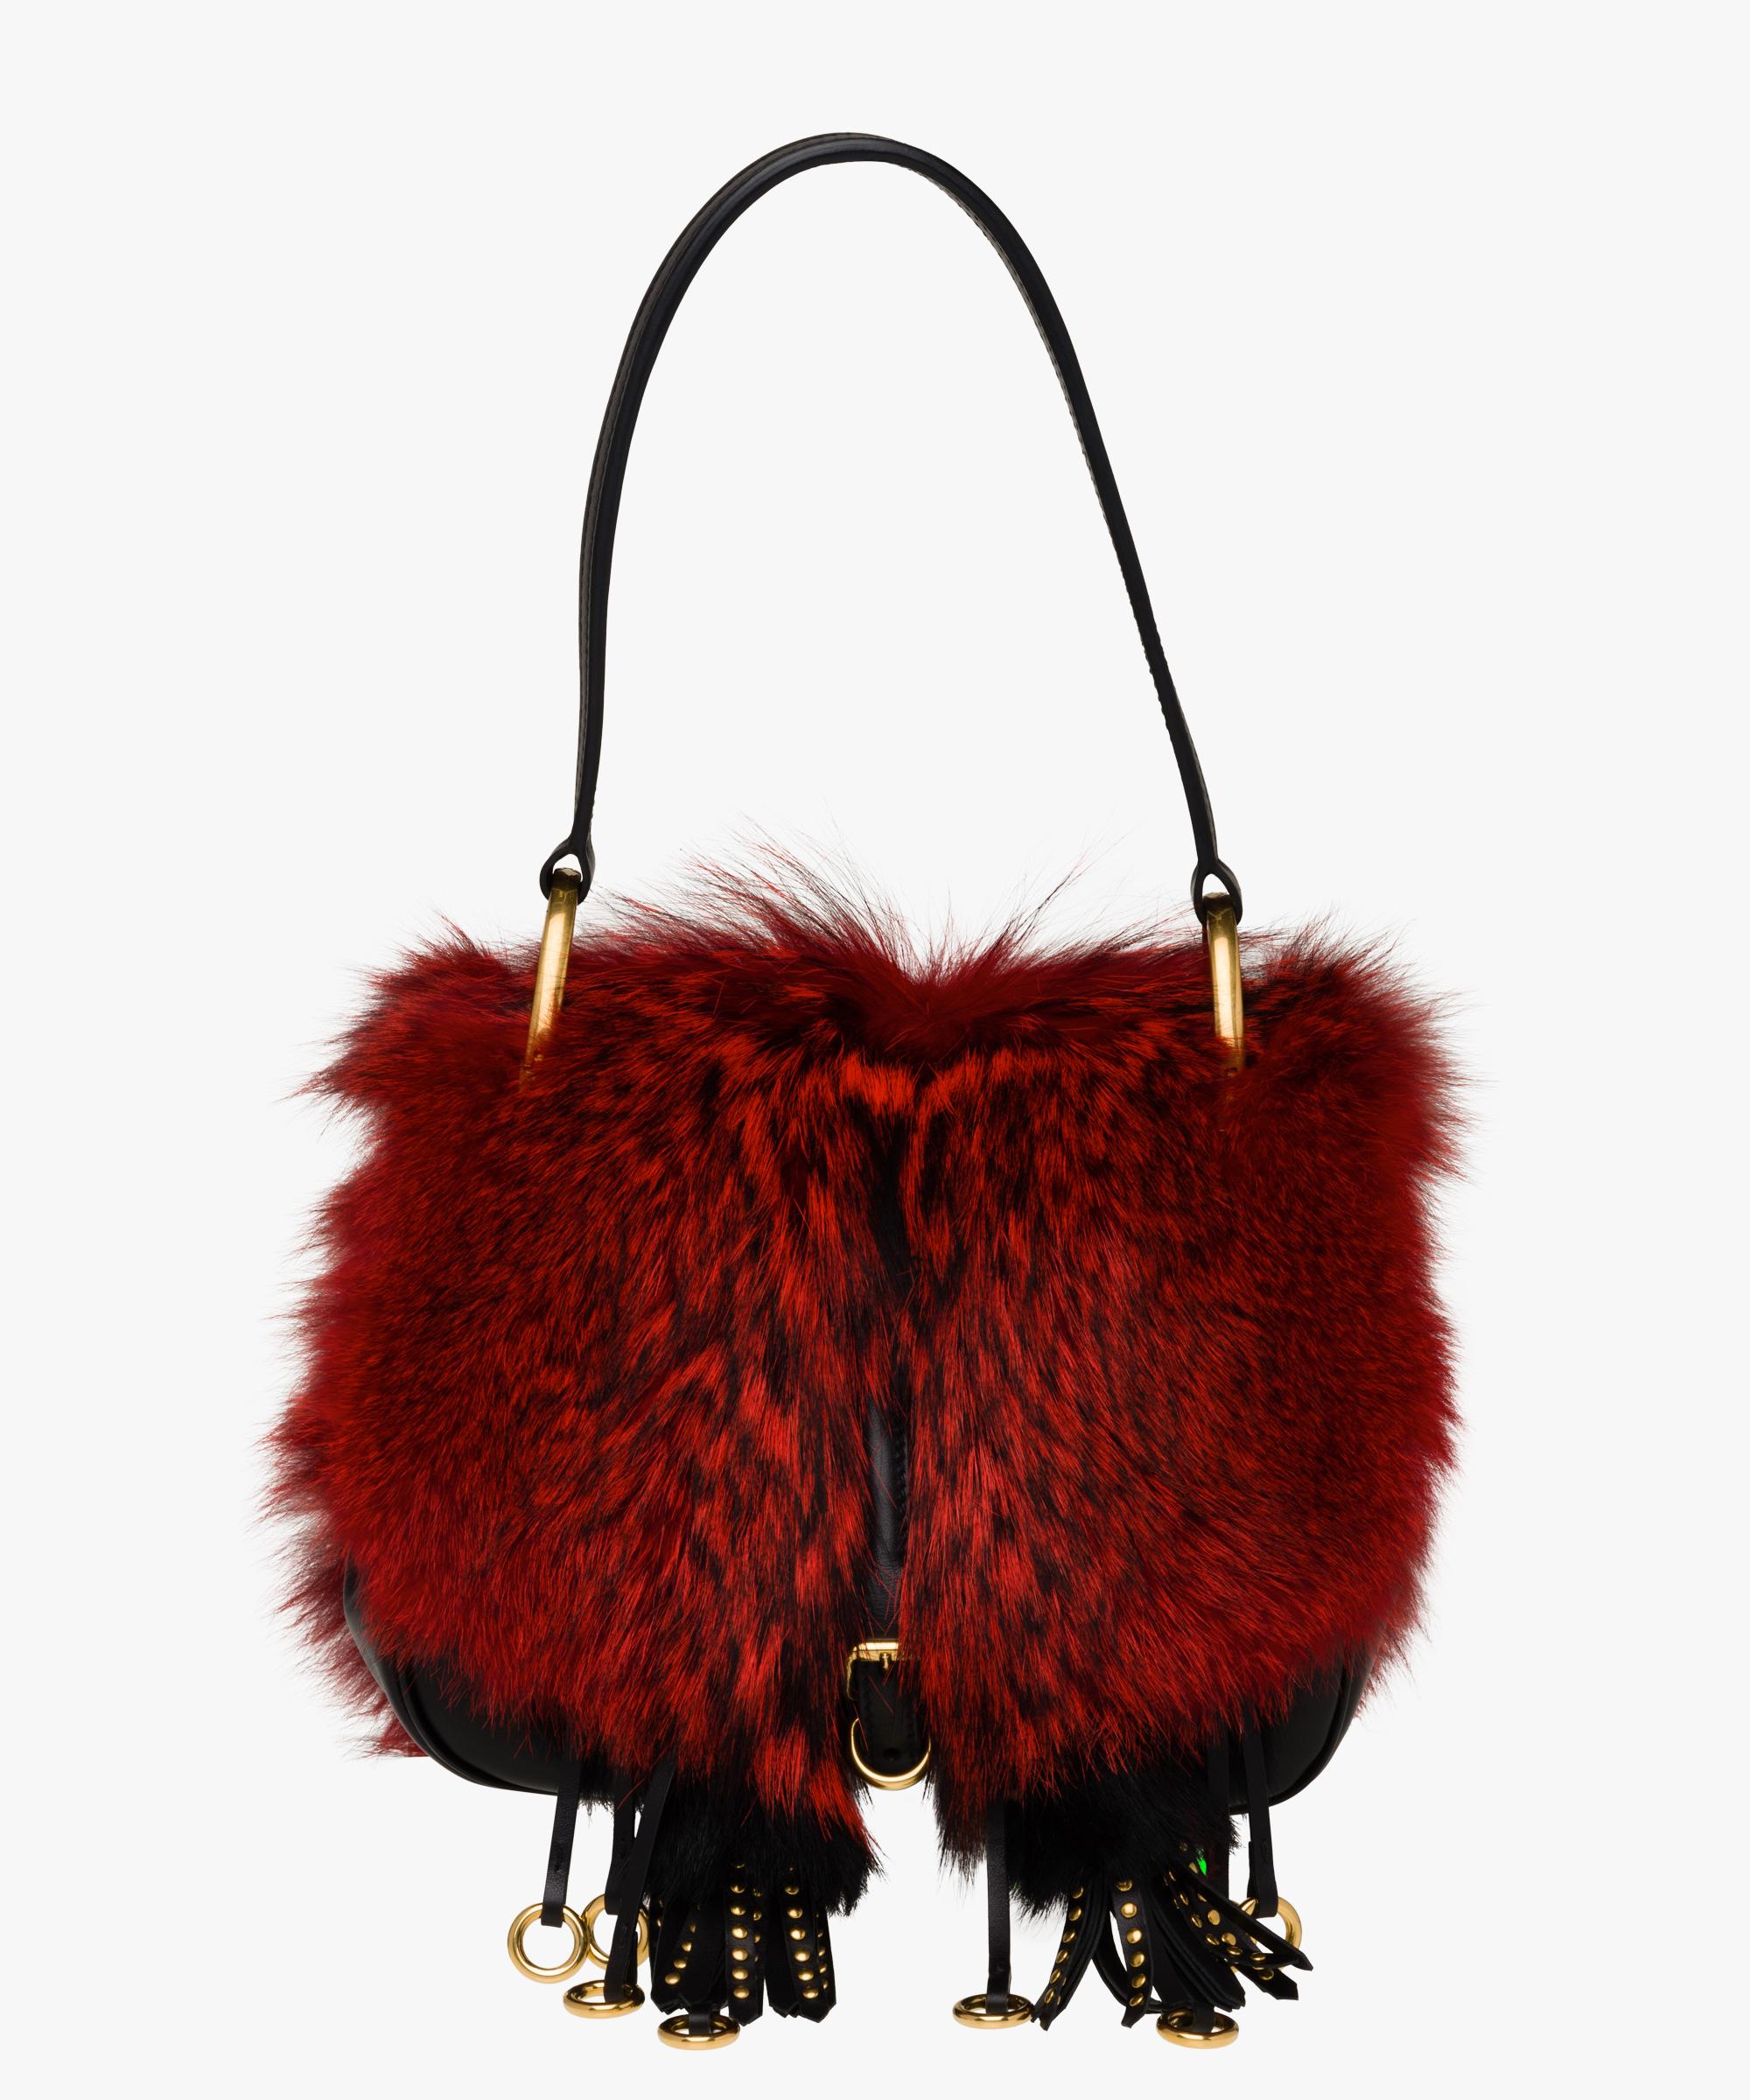 ad979c82cd9722 ... Prada Corsaire Bag Prada RED/BLACK ...